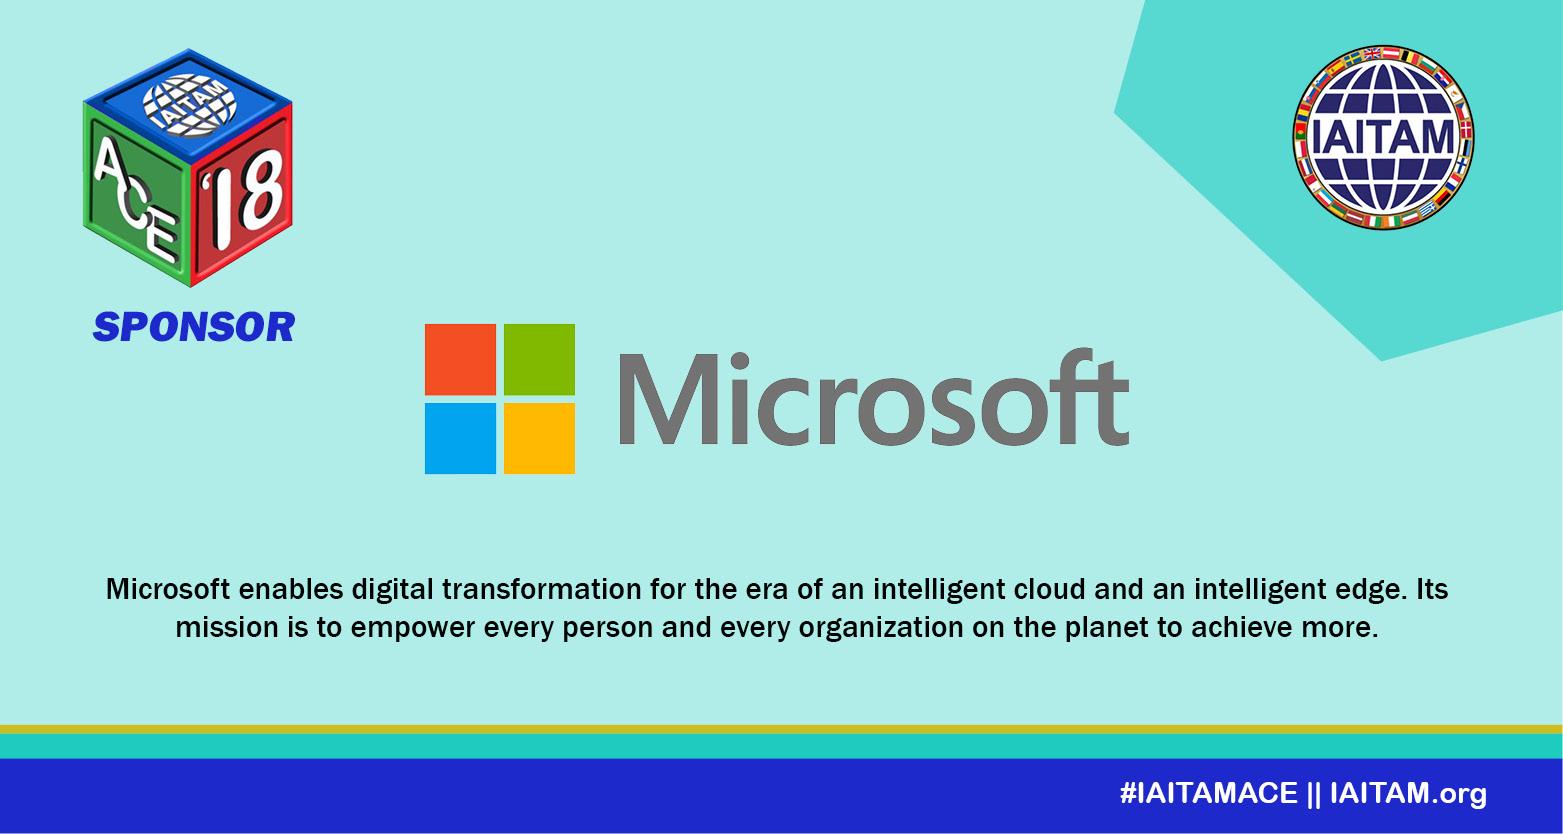 Thank you Microsoft Corporation, Sponsor at the IAITAM ACE!